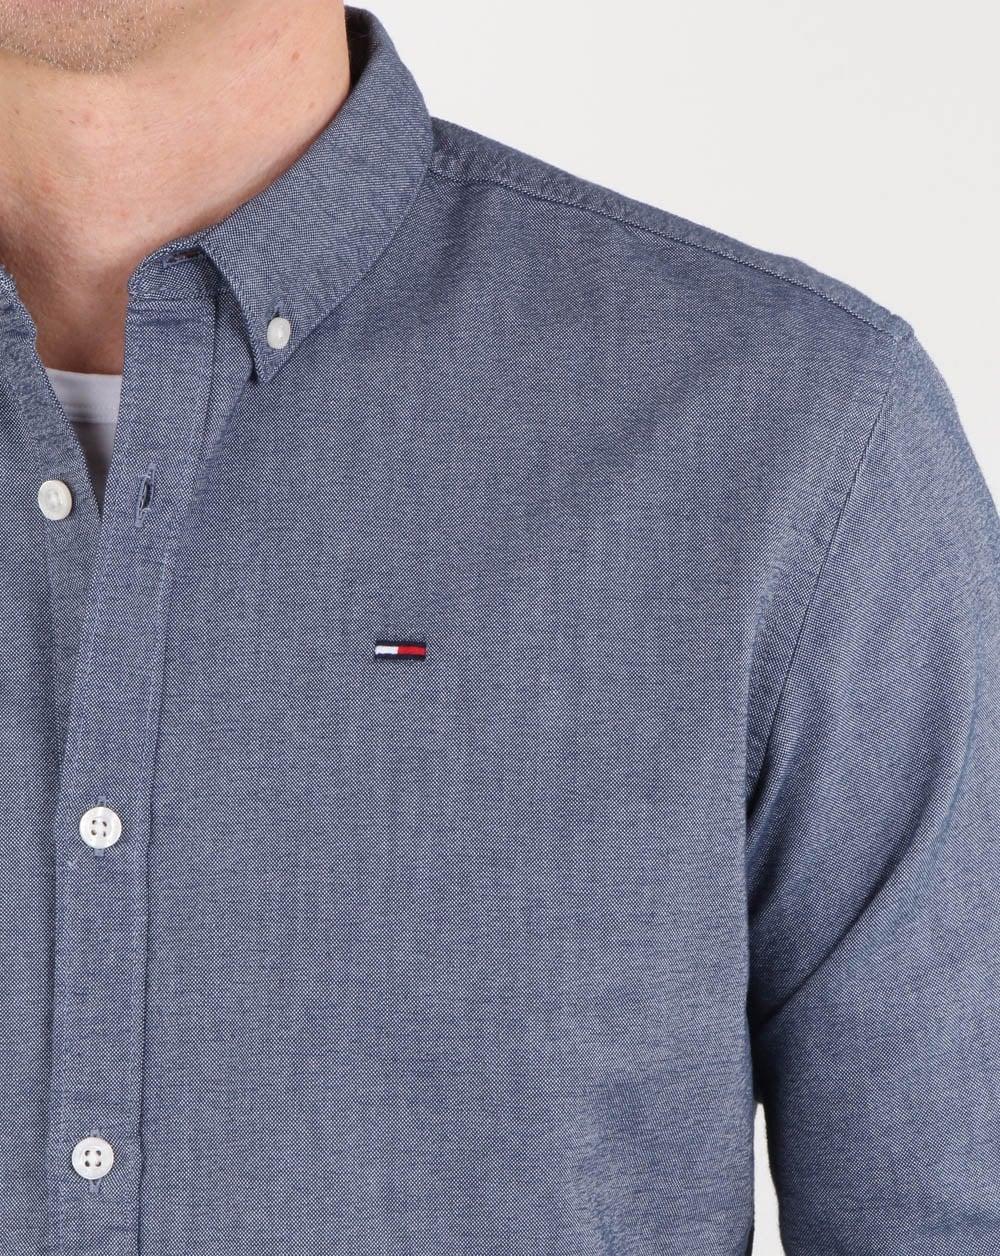 Tommy Hilfiger Cotton Oxford Shirt Navy, mens, Shirt, button collar 221c149b5b96